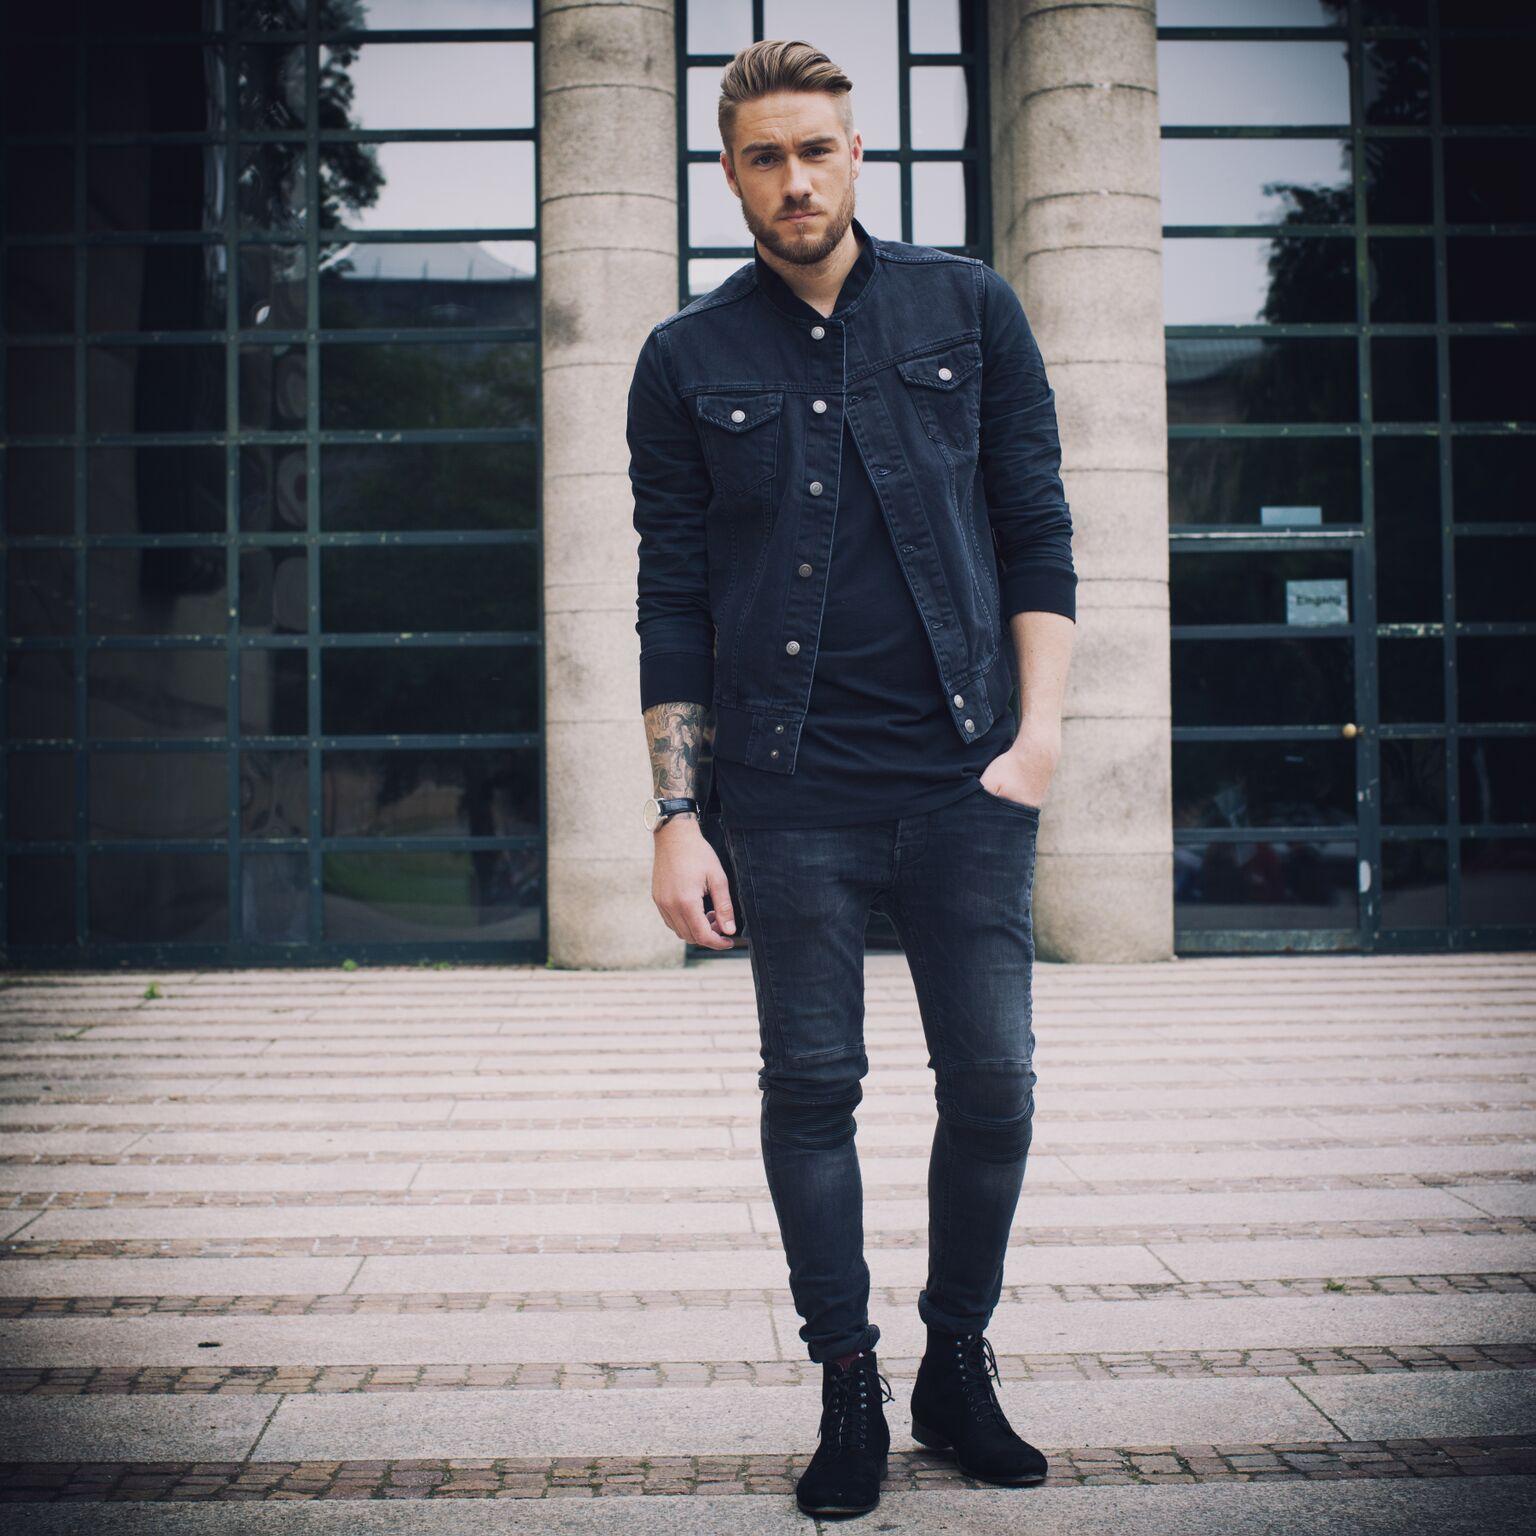 Black t shirt with dark blue jeans - Streetstyle Denim Bomber Jacket In Dark Denim Black Crew Neck T Shirt